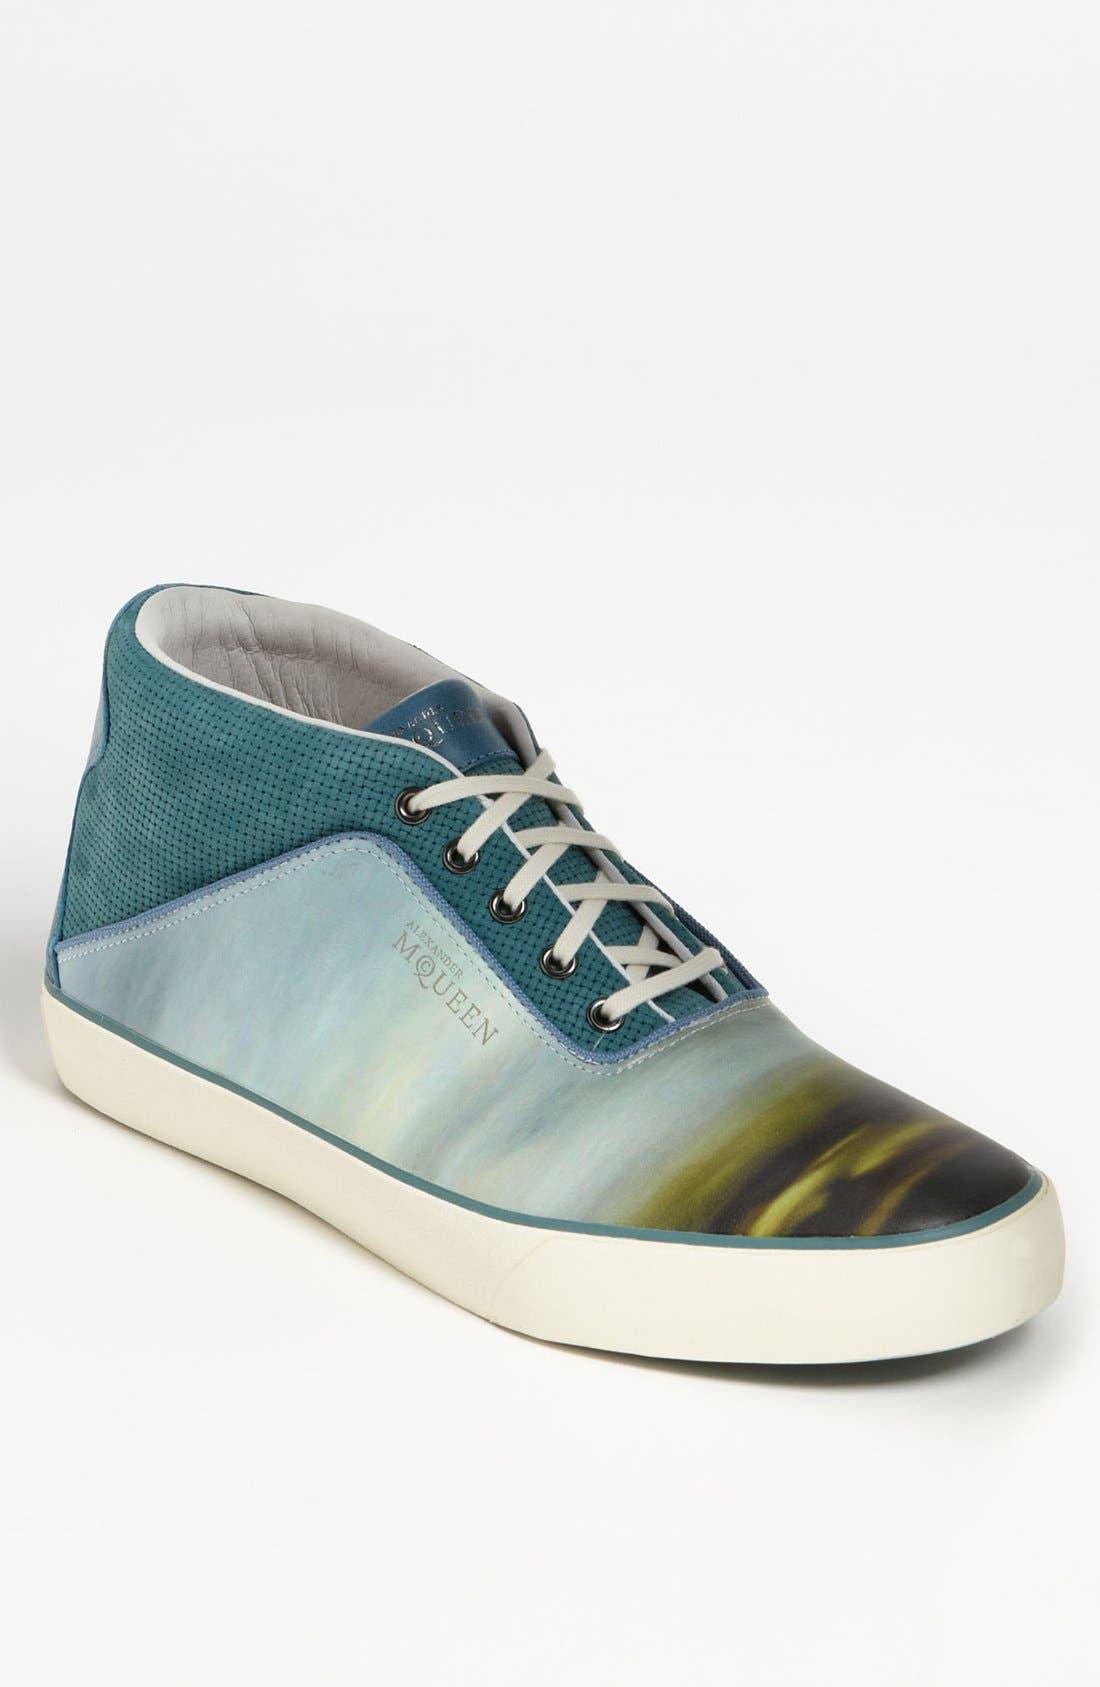 Alternate Image 1 Selected - PUMA 'Alexander McQueen - Amqdek Mid II' Sneaker (Men)